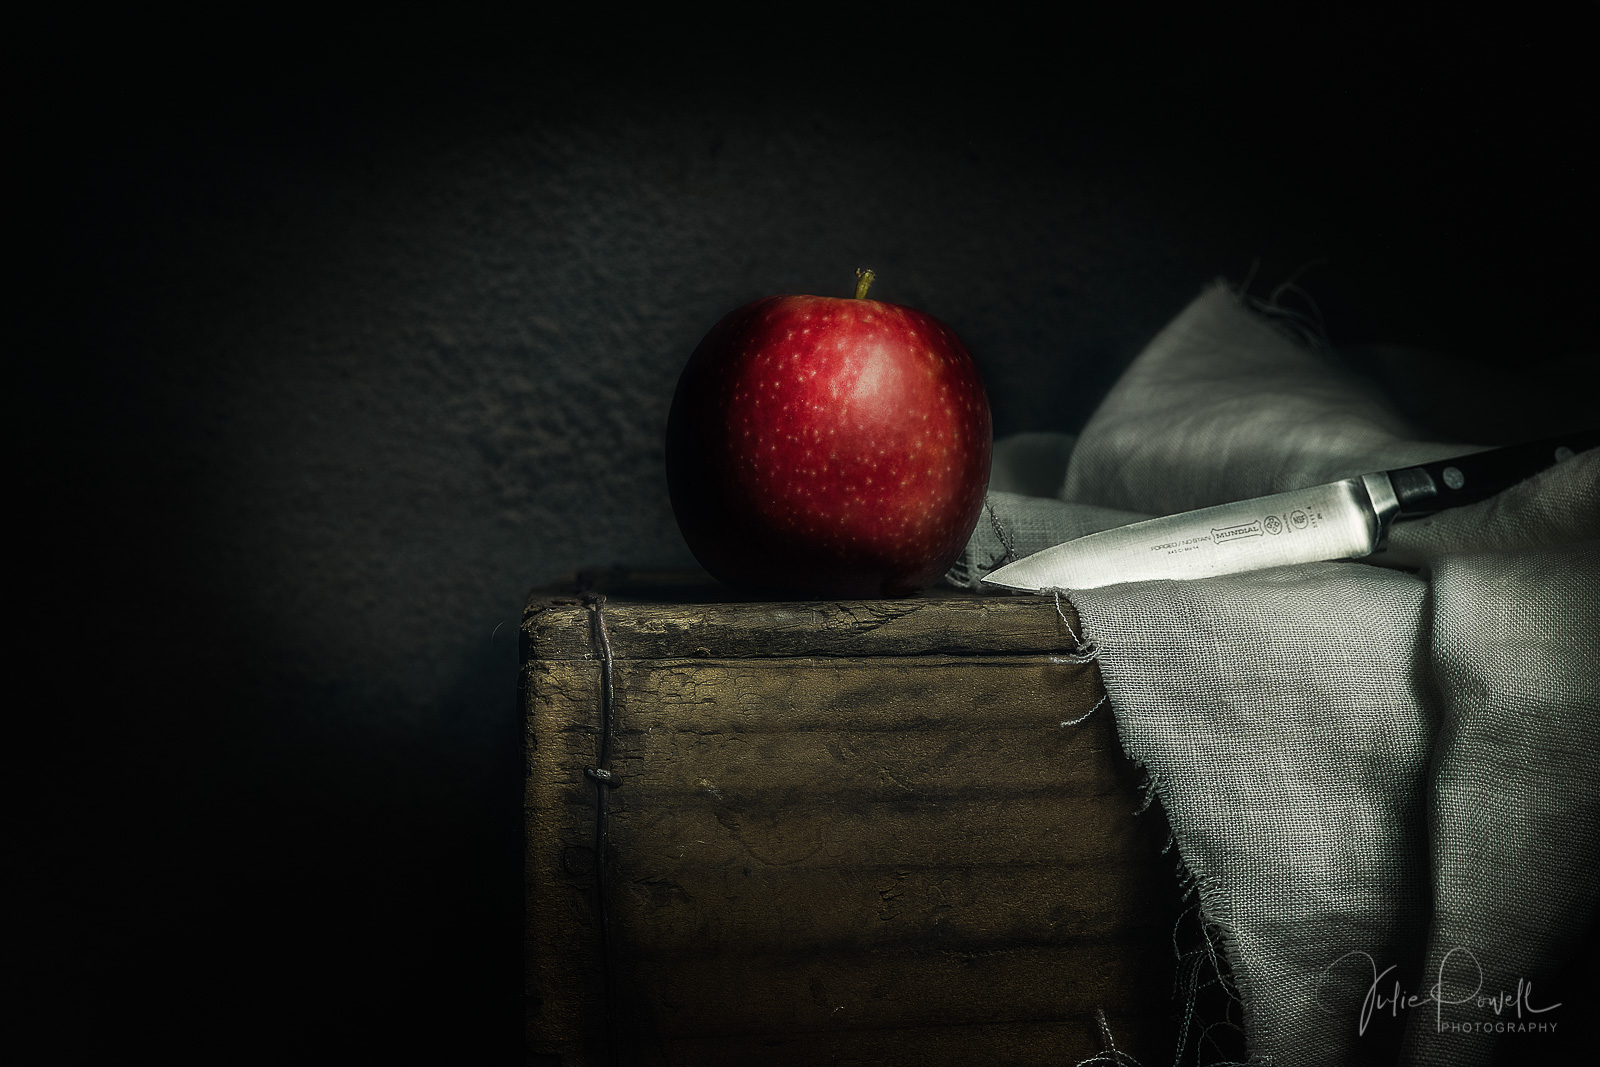 Julie Powell_The Apple.jpg